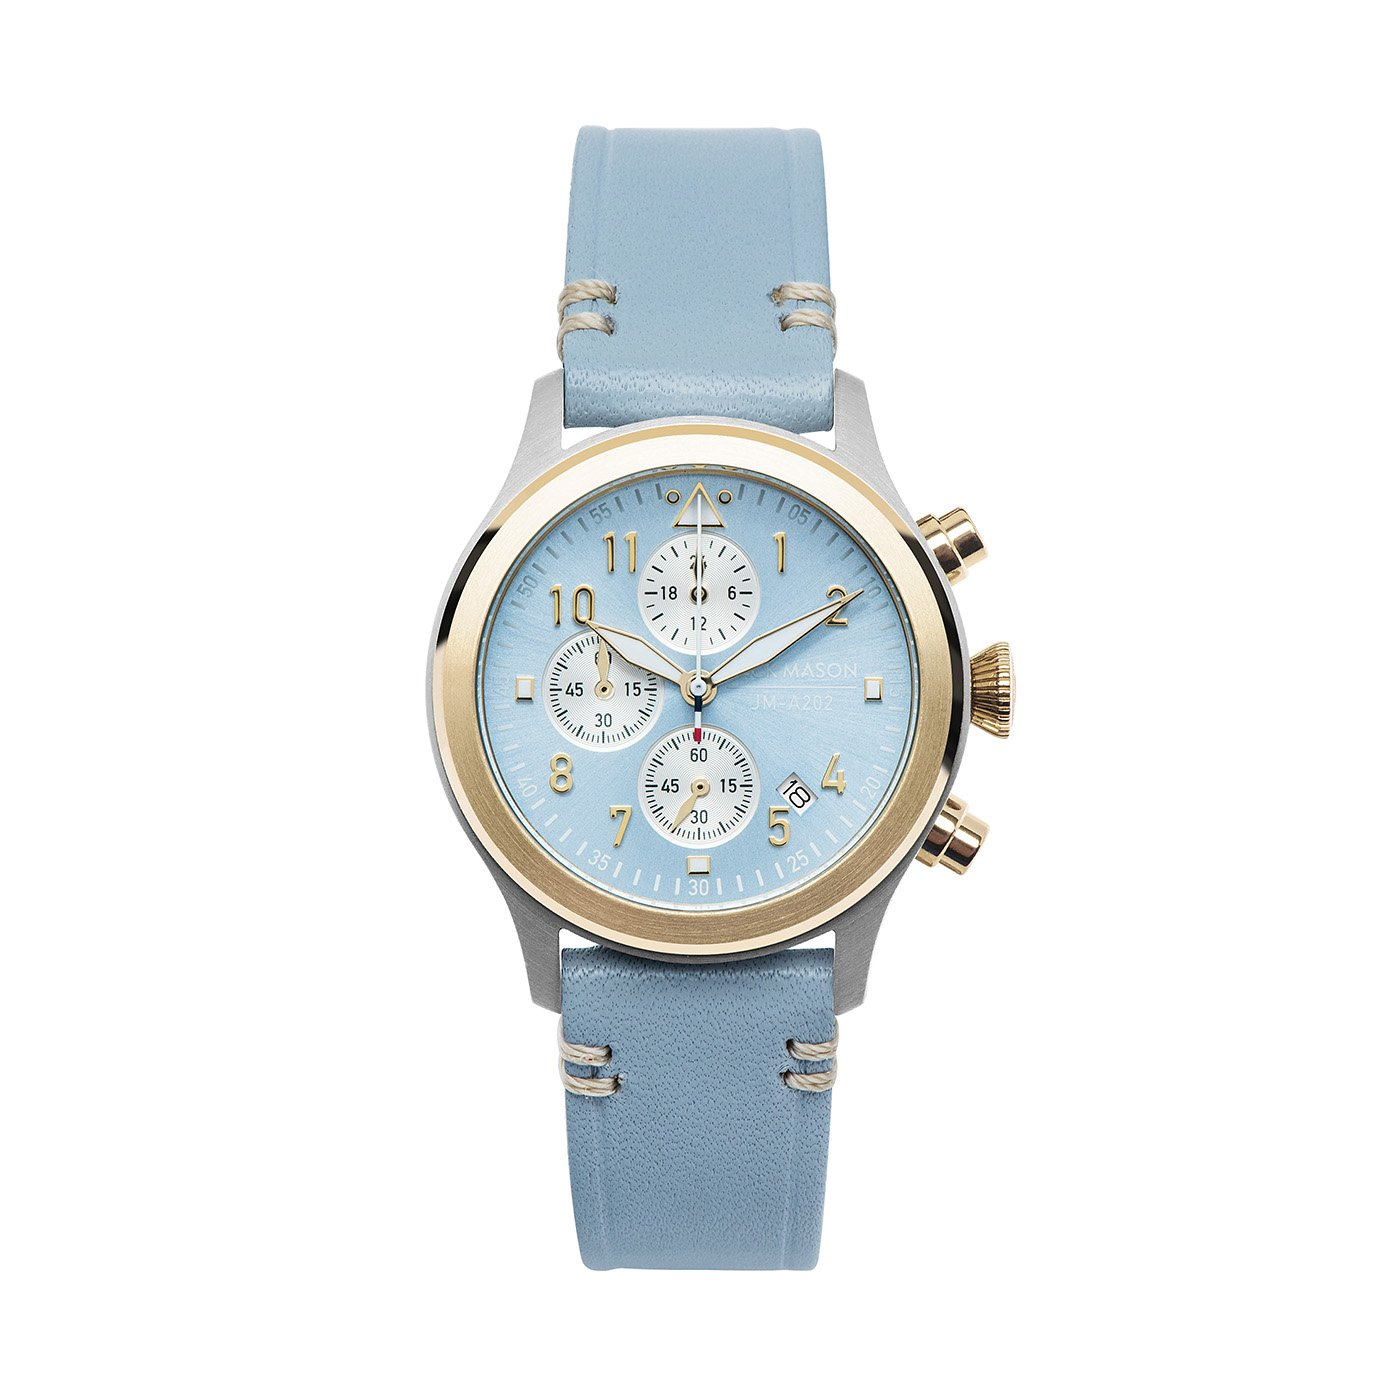 Jack Mason Women's Chronograph Watch Aviator Light Blue Leather Strap JM-A202-223 by Jack Mason